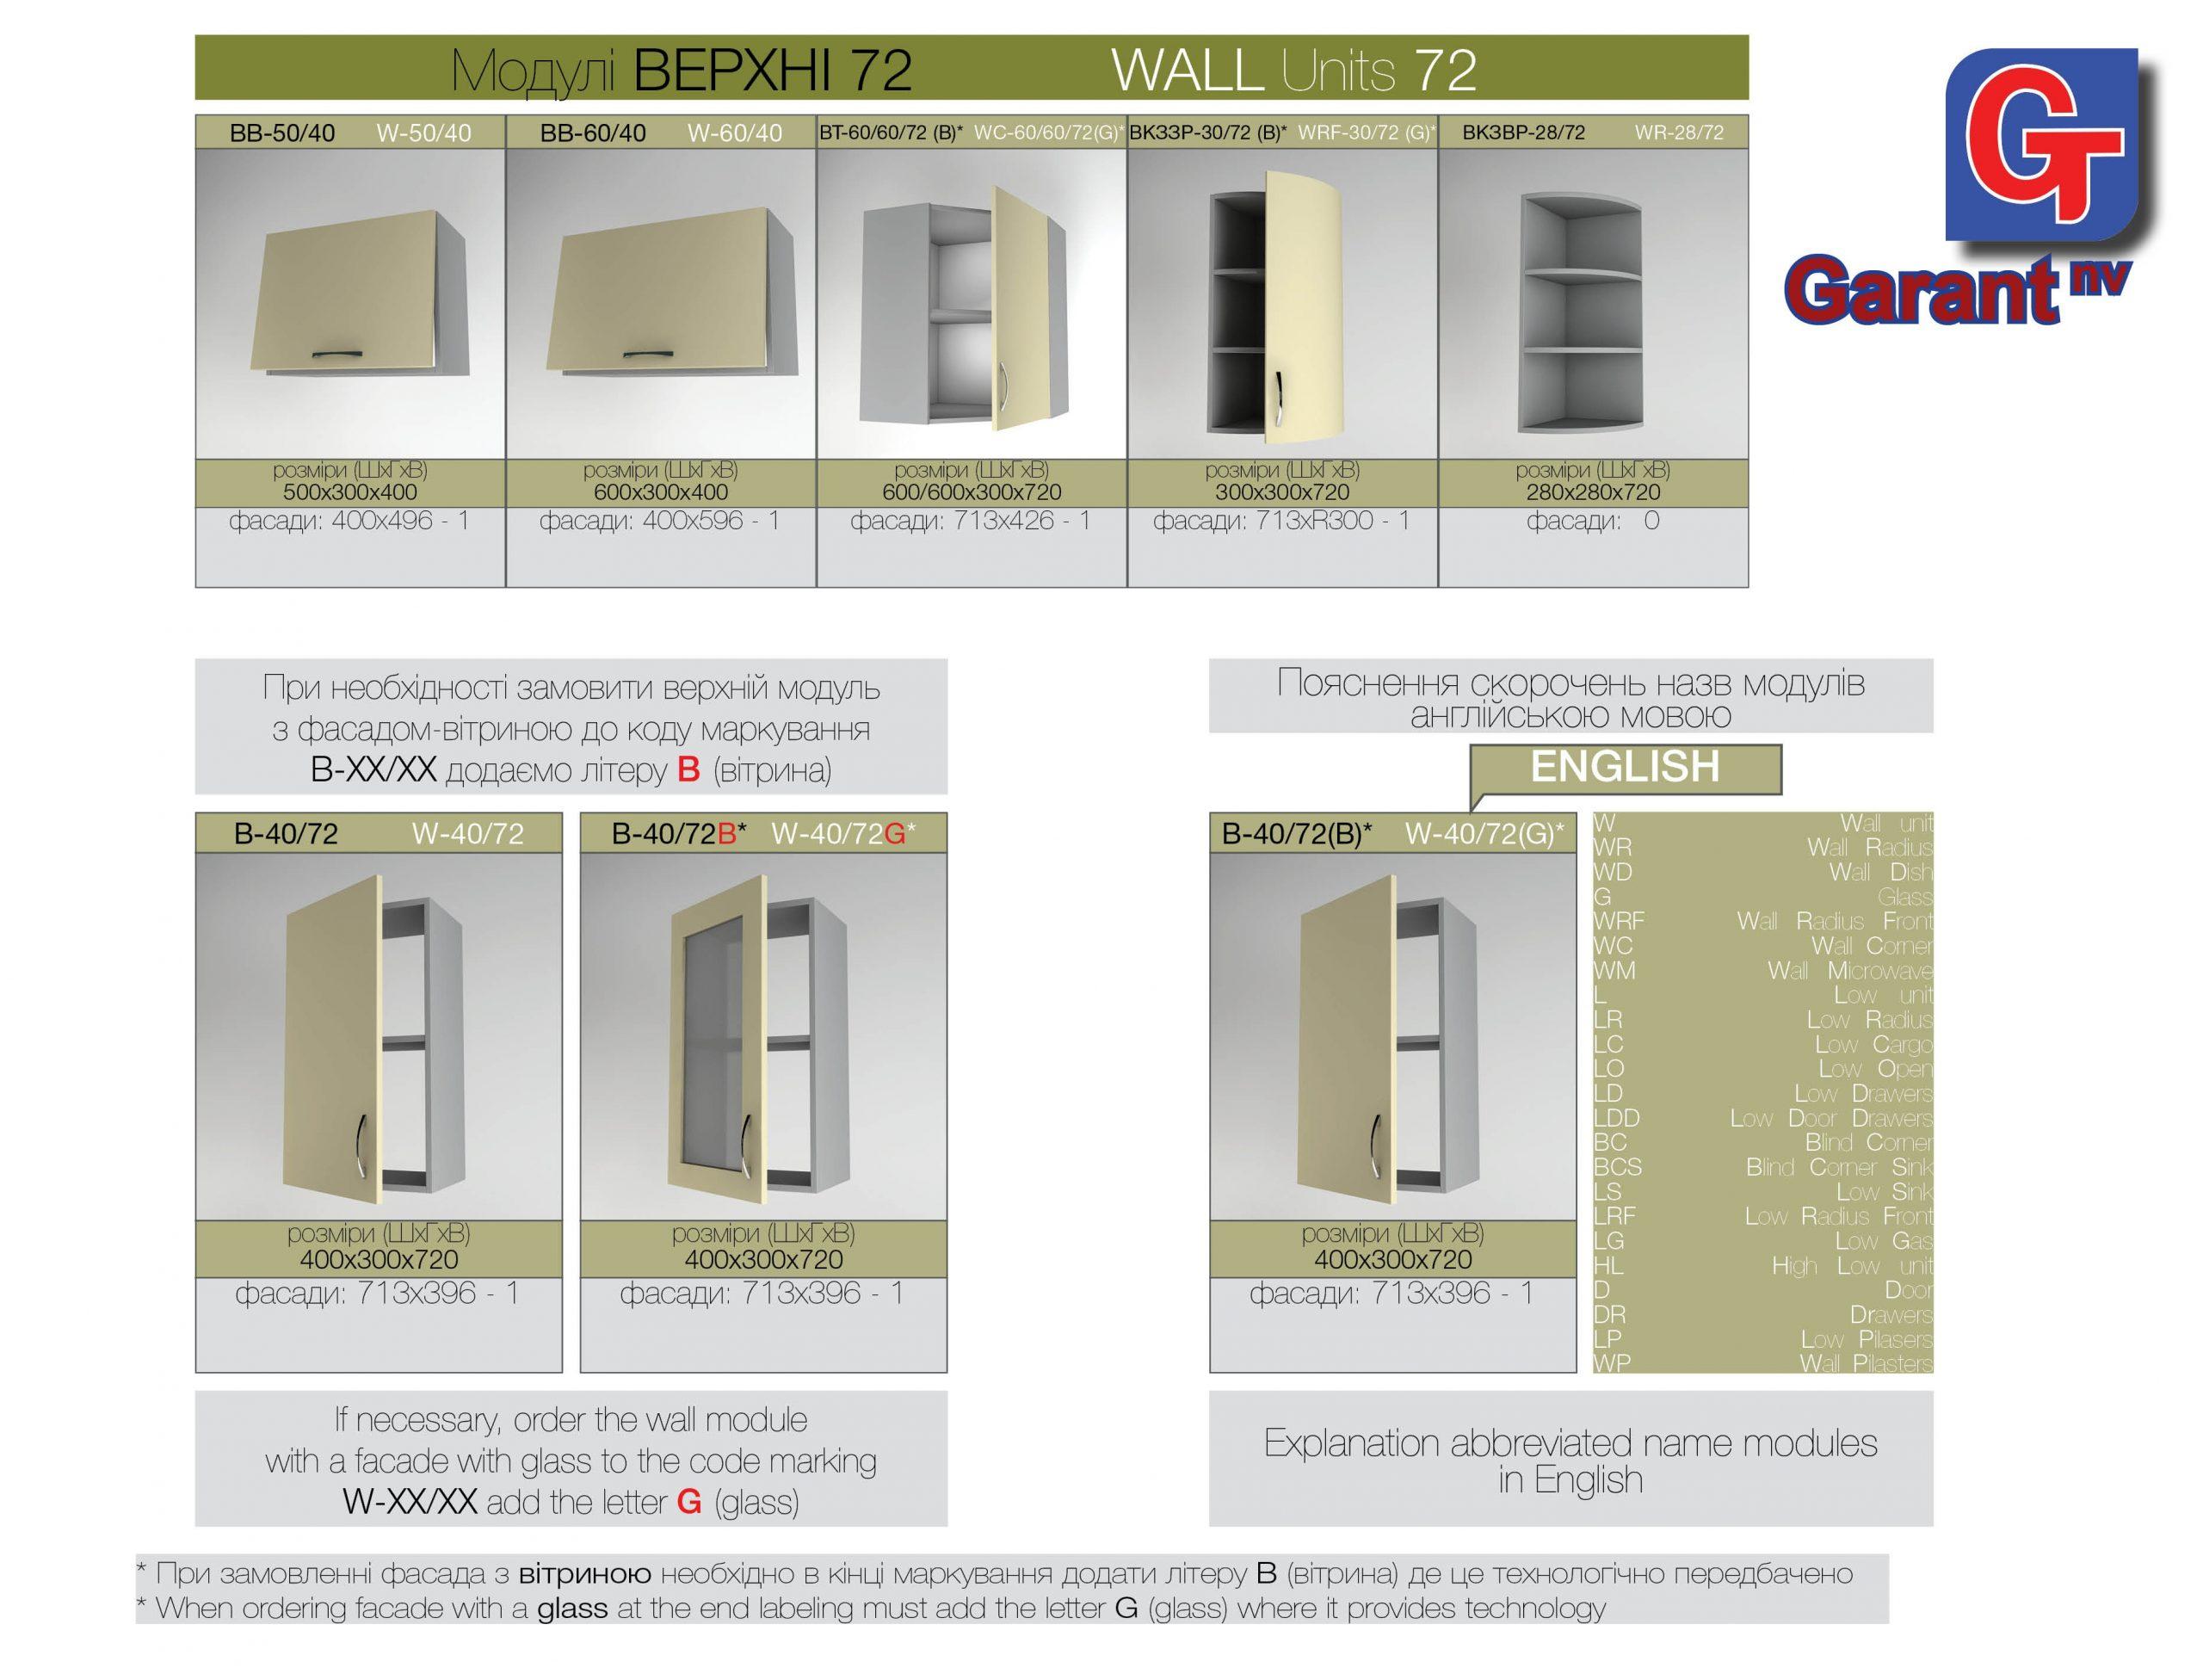 wall_units_02